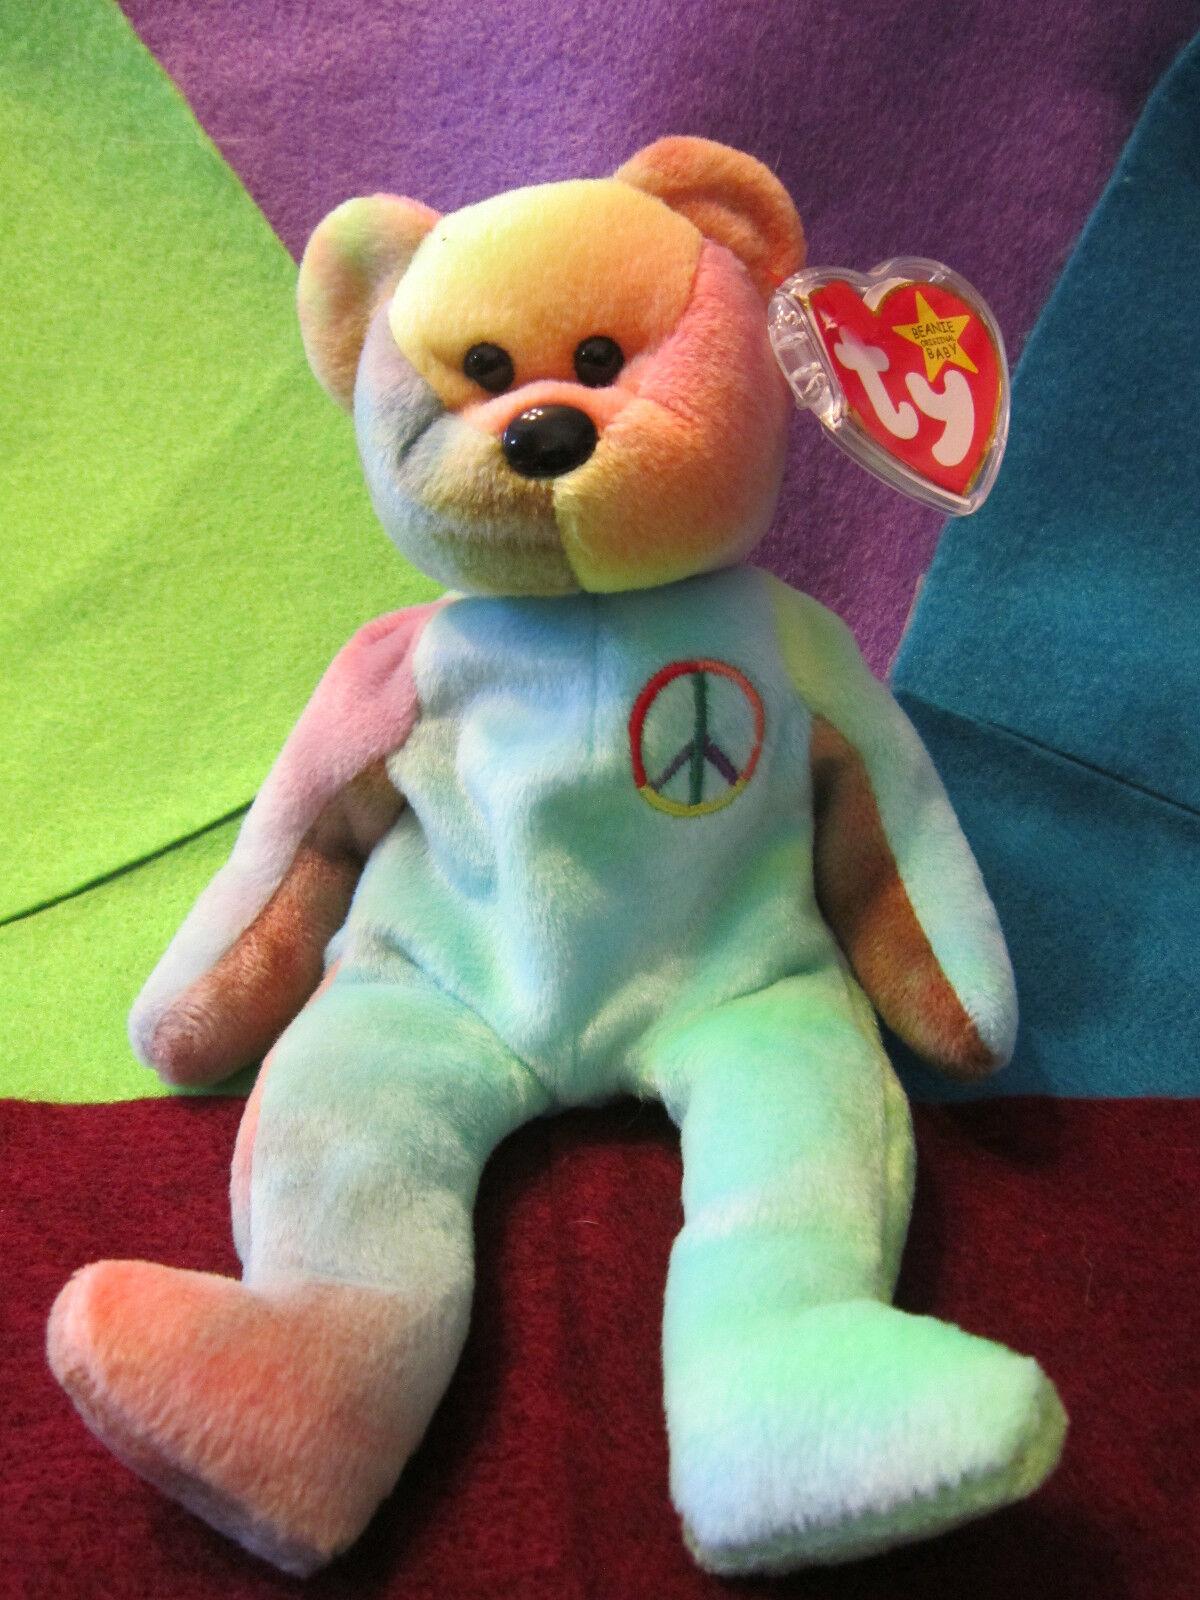 TY Beanie Babie Original Peace DOB February 1, 1996  MWMT in a Bag Origiinal